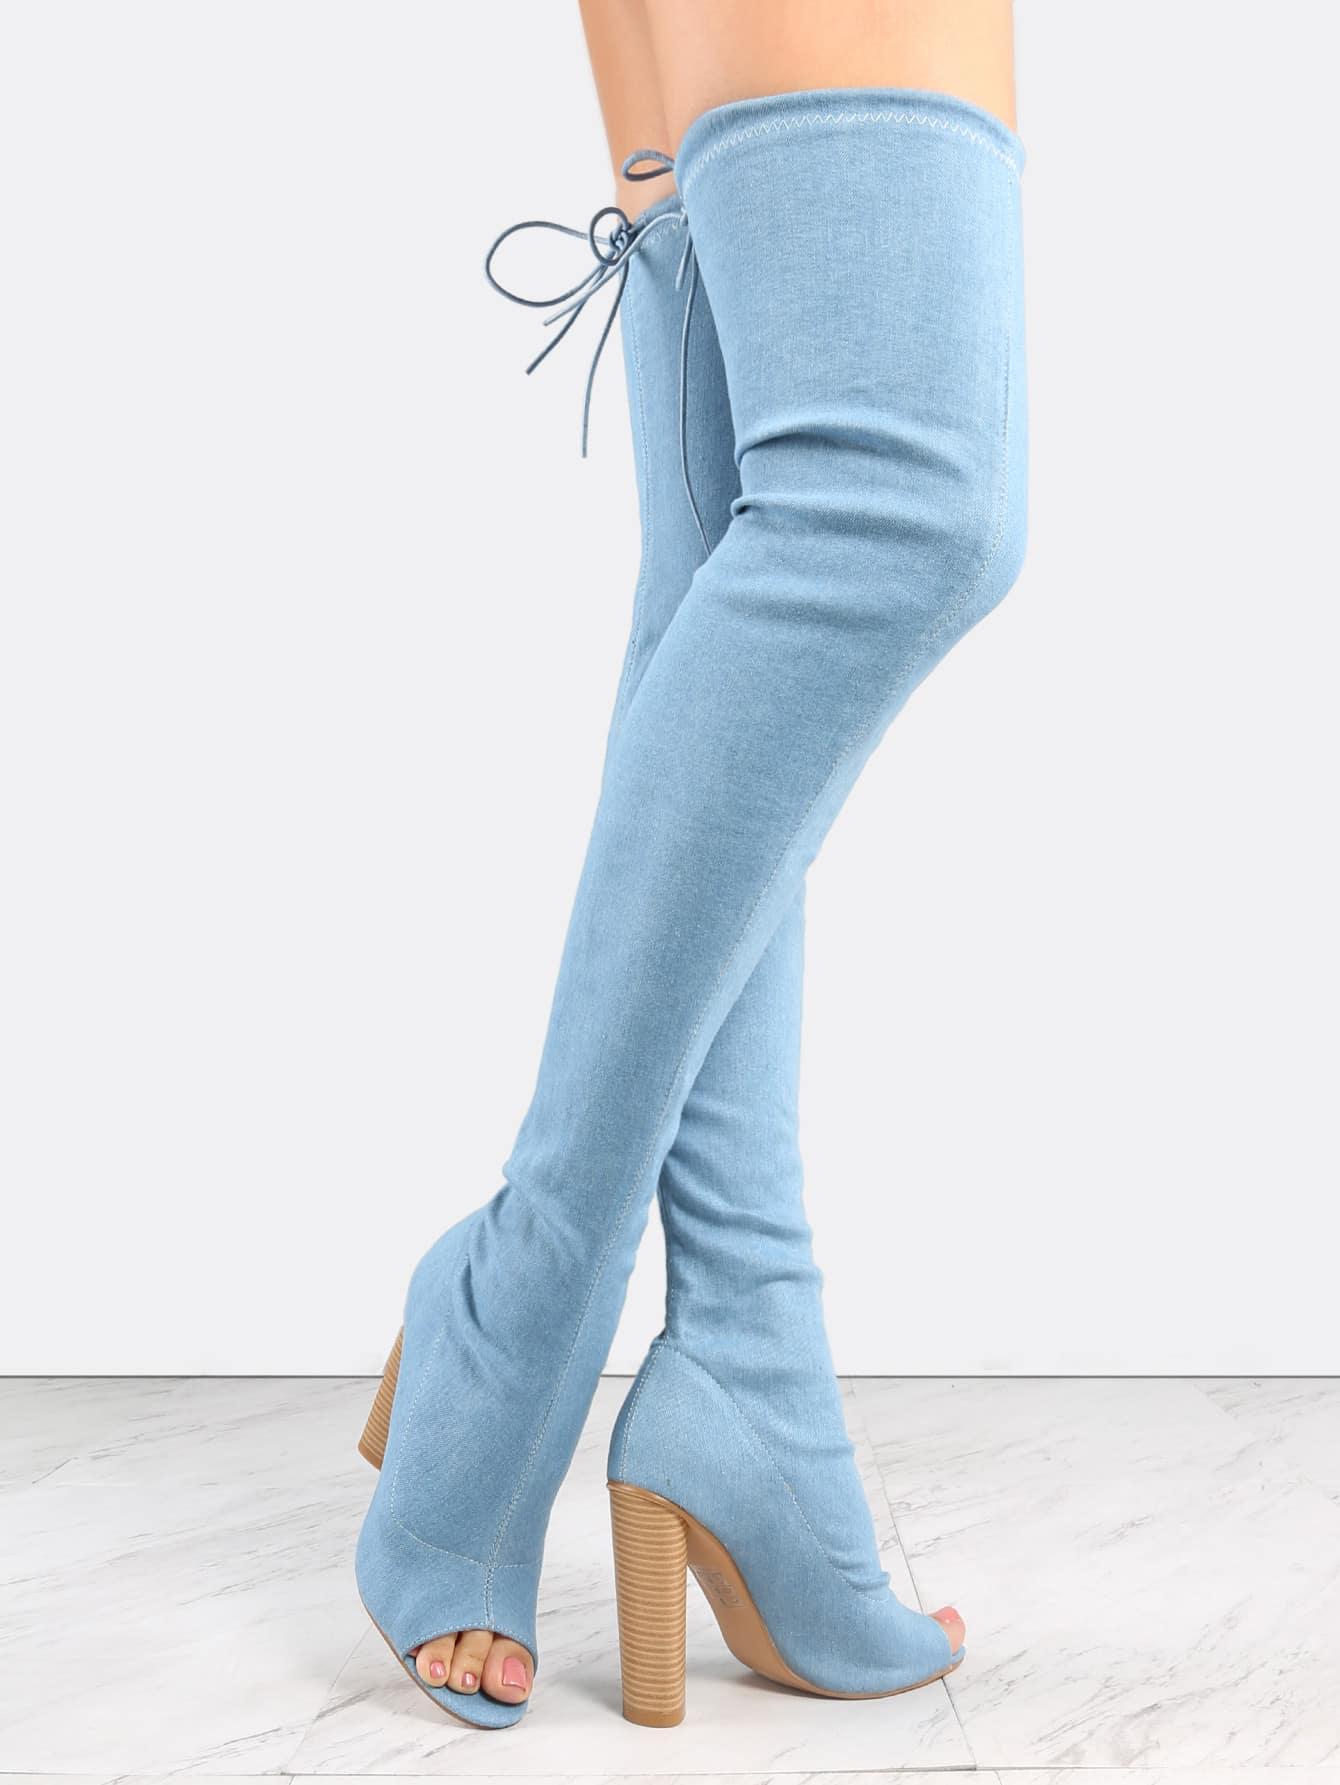 Blue Denim Peep Toe Chunky Heel Over The Knee Boots